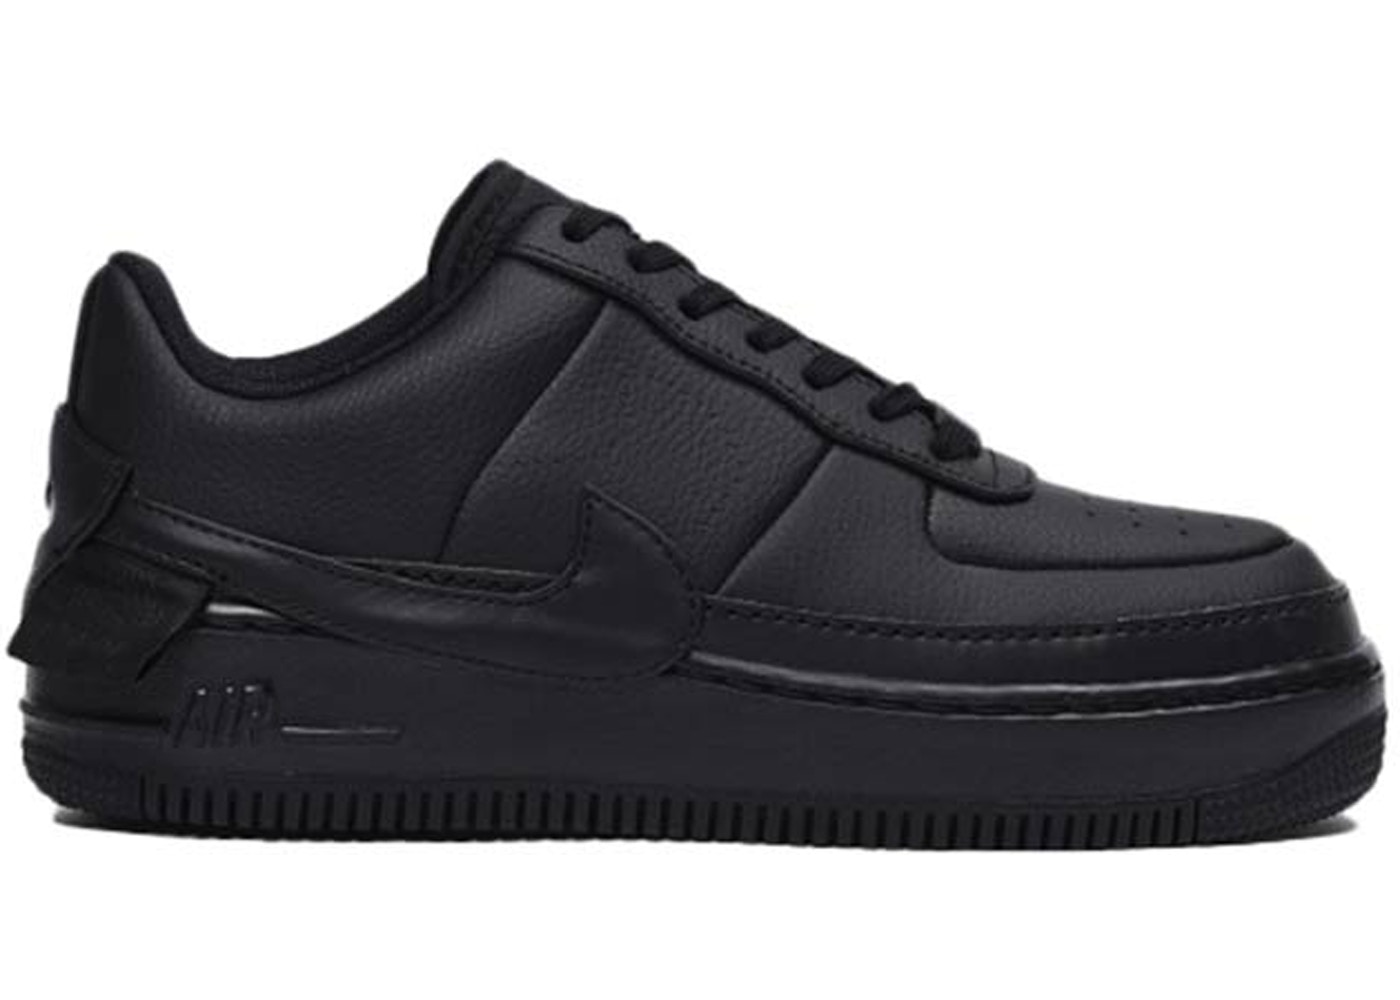 sale retailer 2b771 e0a6c Air Force 1 Jester XX Triple Black (W)